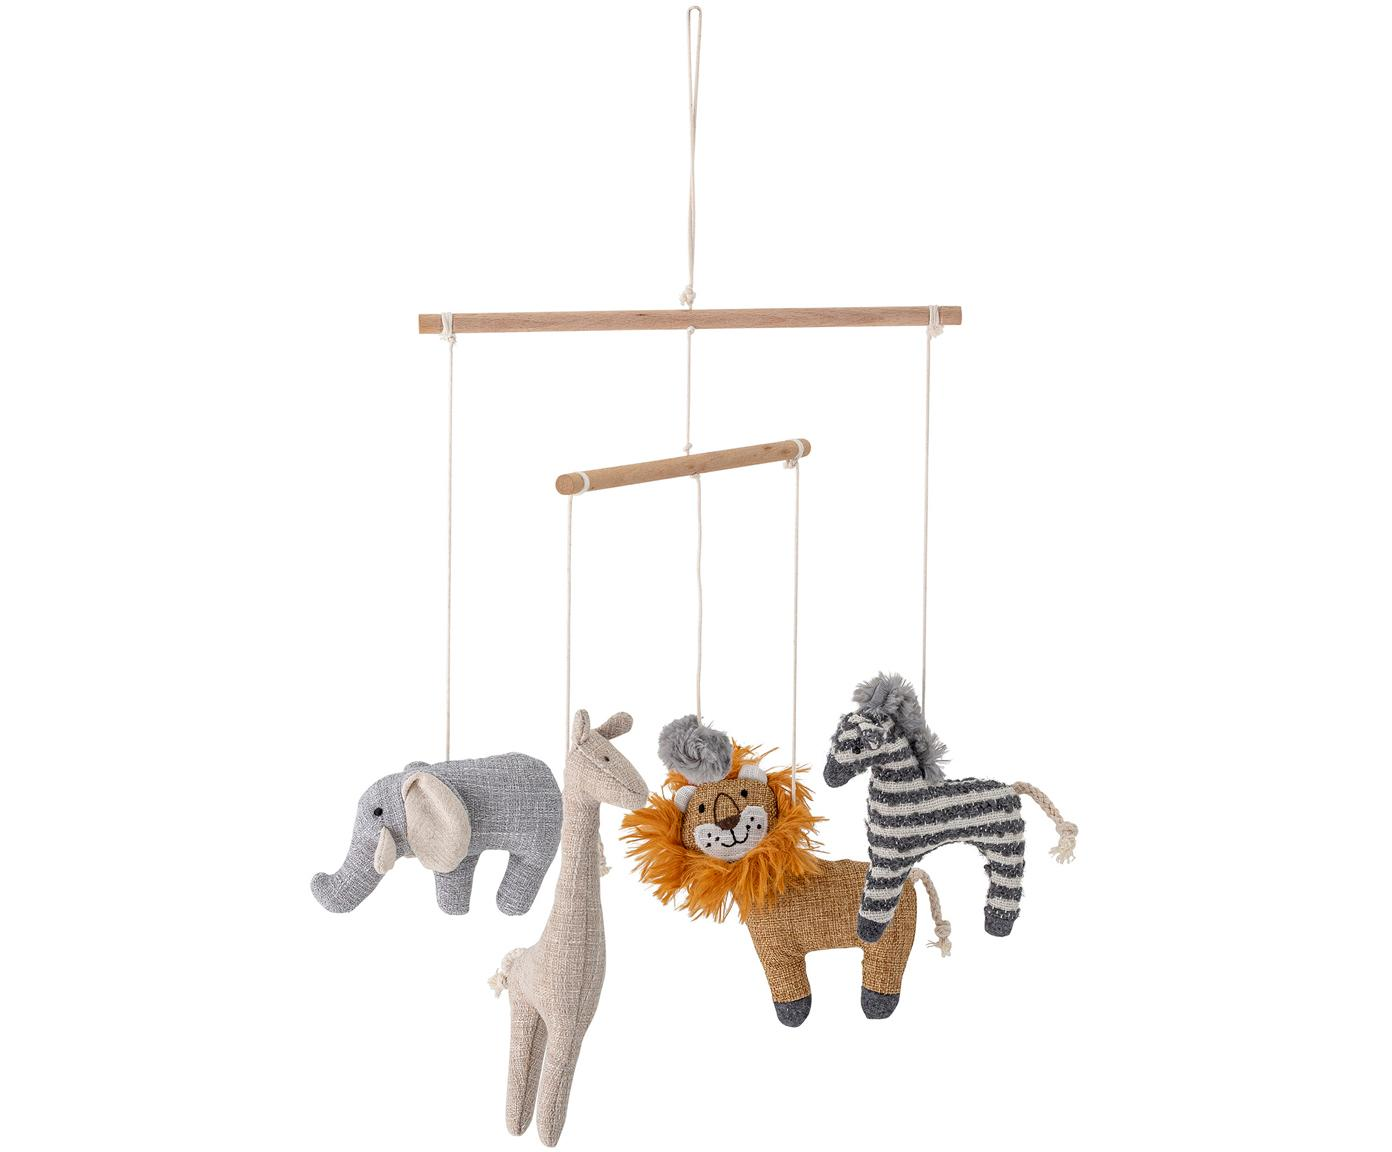 Babymobiel Animals, Polyester, linnen, berkenhout, Multicolour, Ø 26 cm